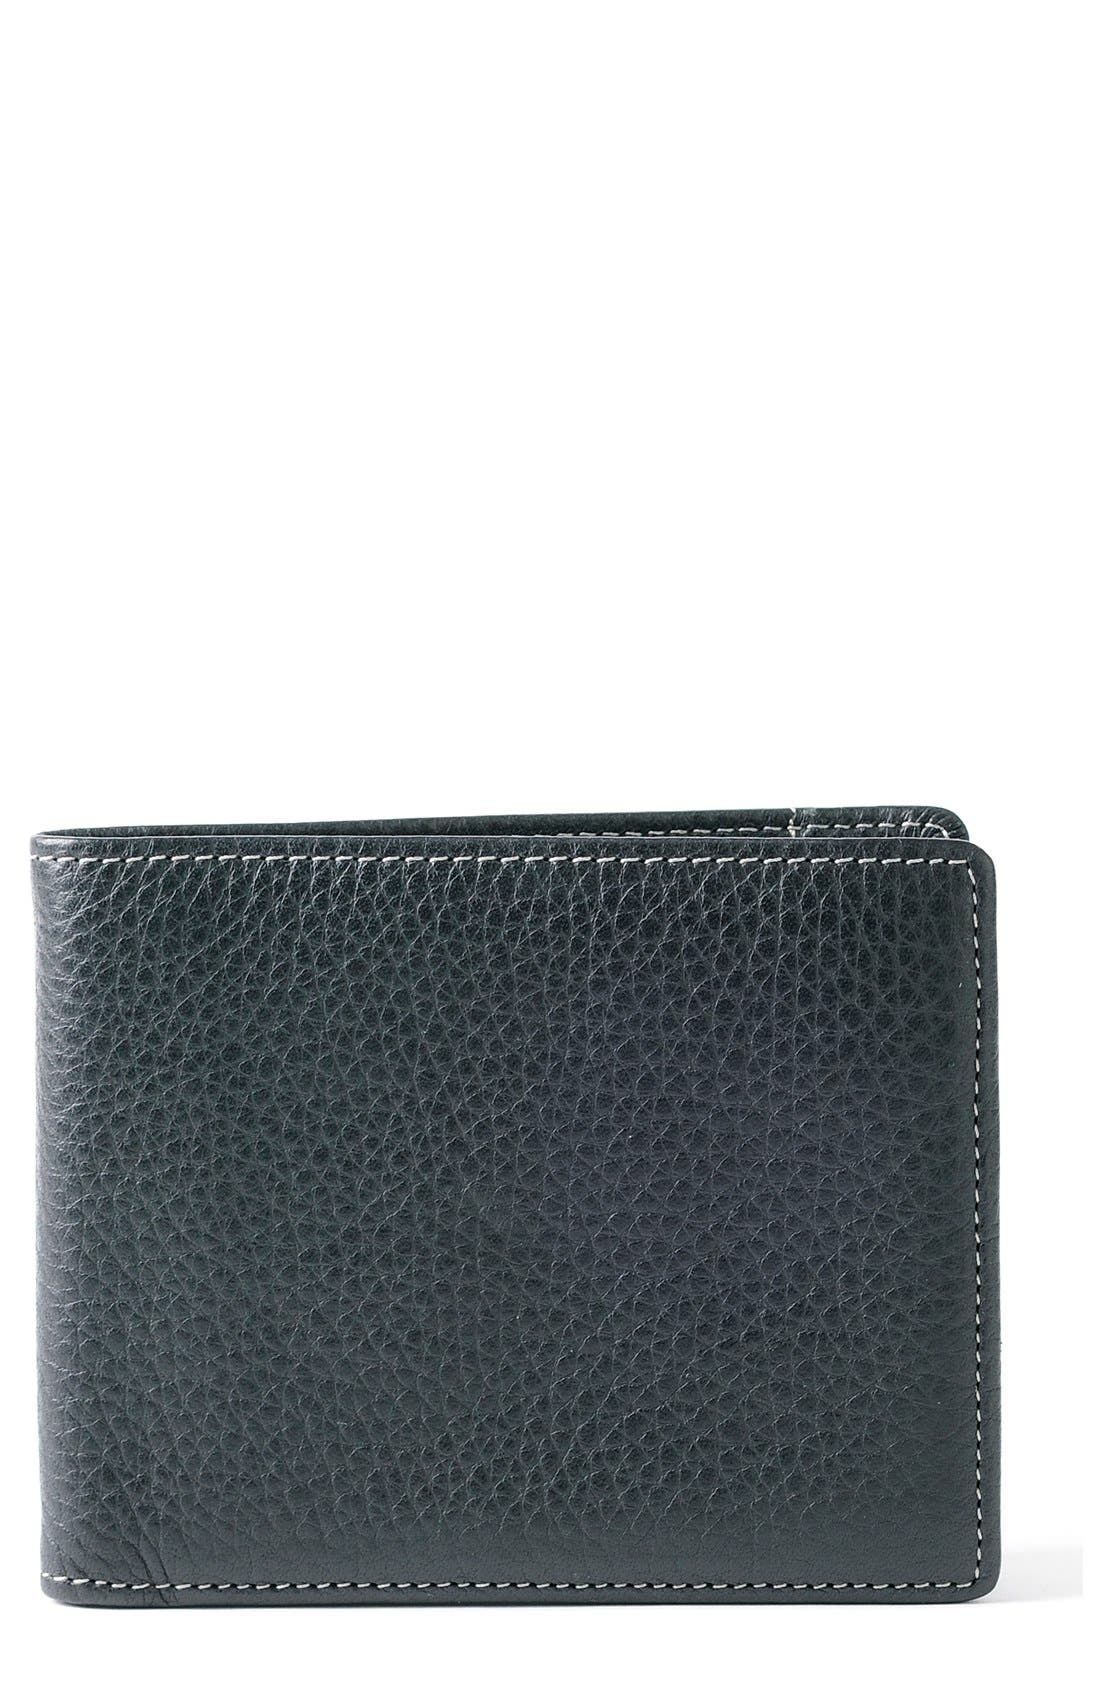 Alternate Image 1 Selected - Boconi 'Tyler' RFID Wallet